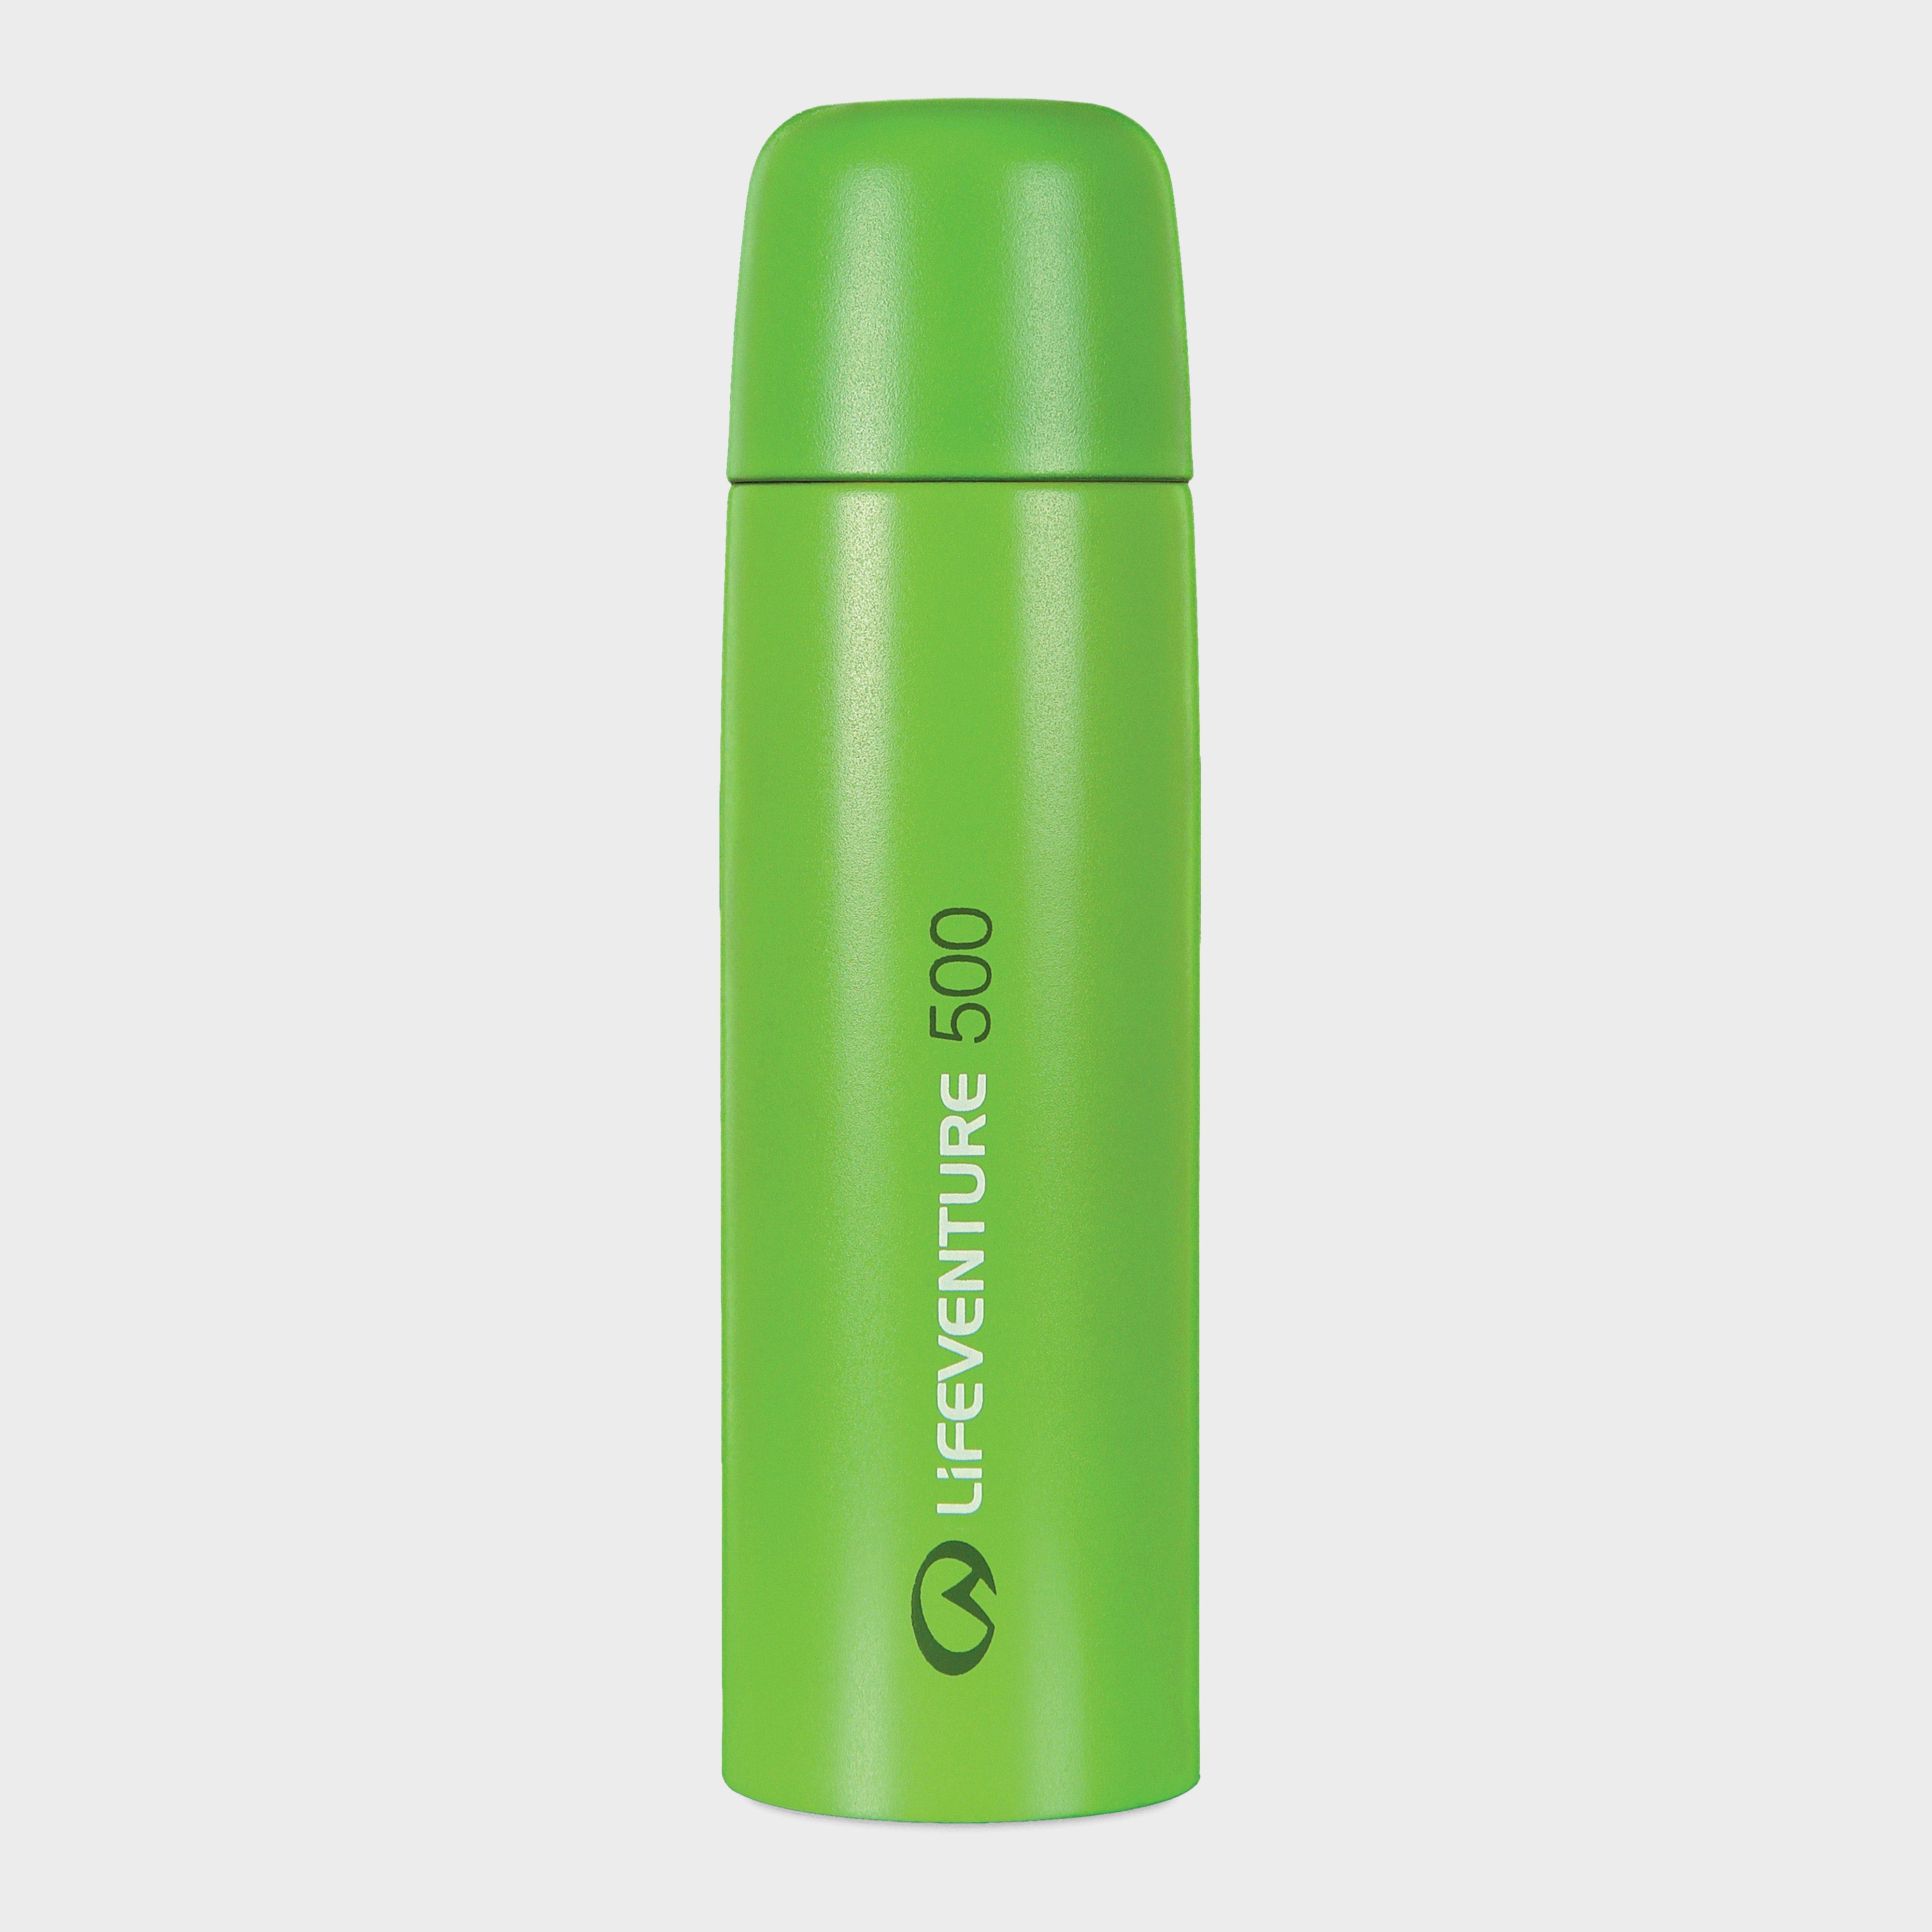 Lifeventure Lifeventure TiV 500ml Flask - Green, Green